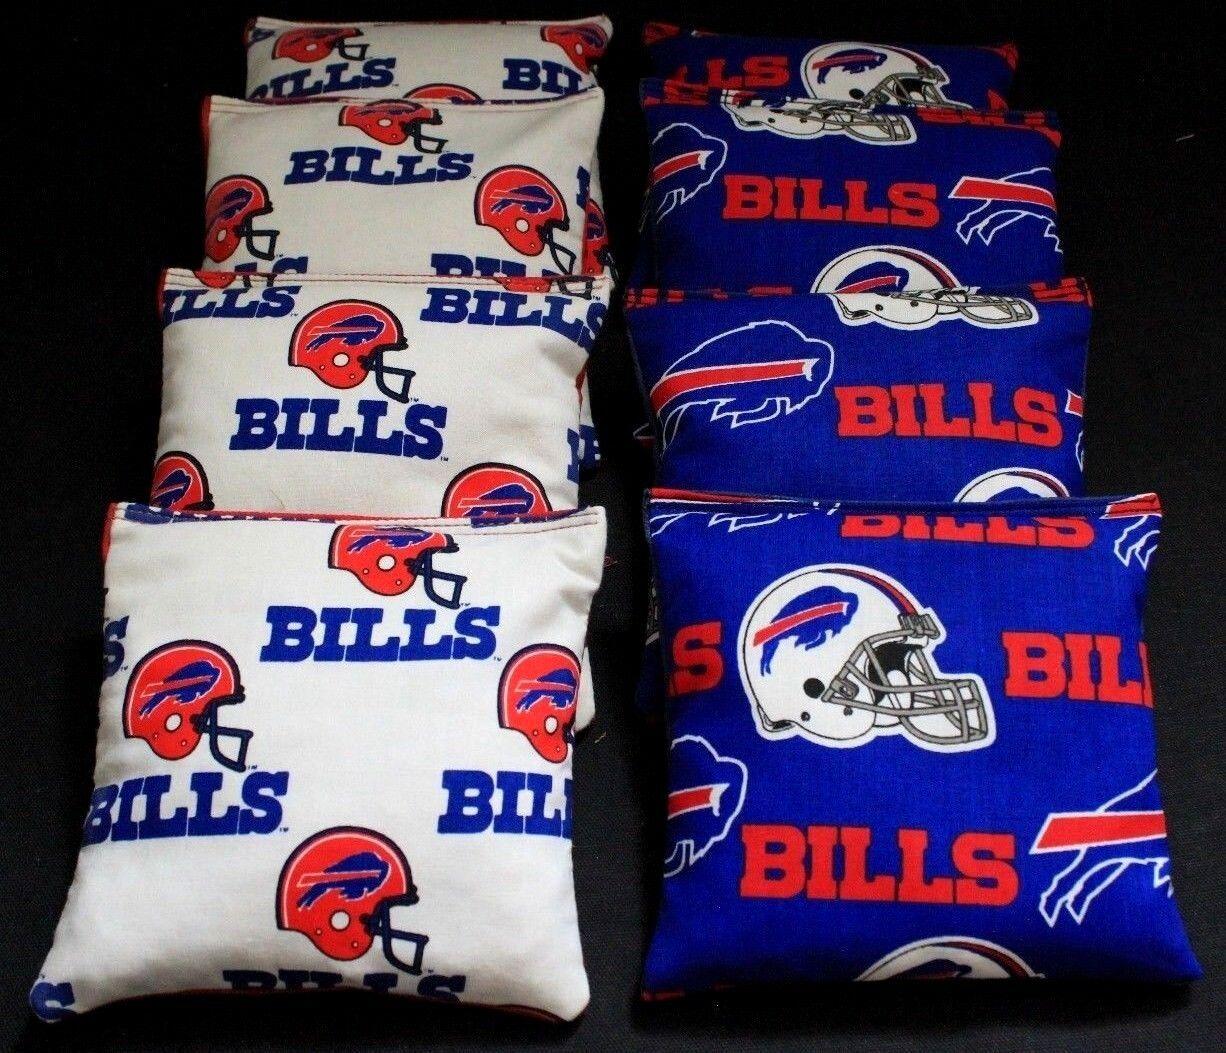 RARE BUFFALO BILLS 8 CORNHOLE BEAN BAG  TOSS BAGGO NFL Top Quality Handmade   enjoy saving 30-50% off